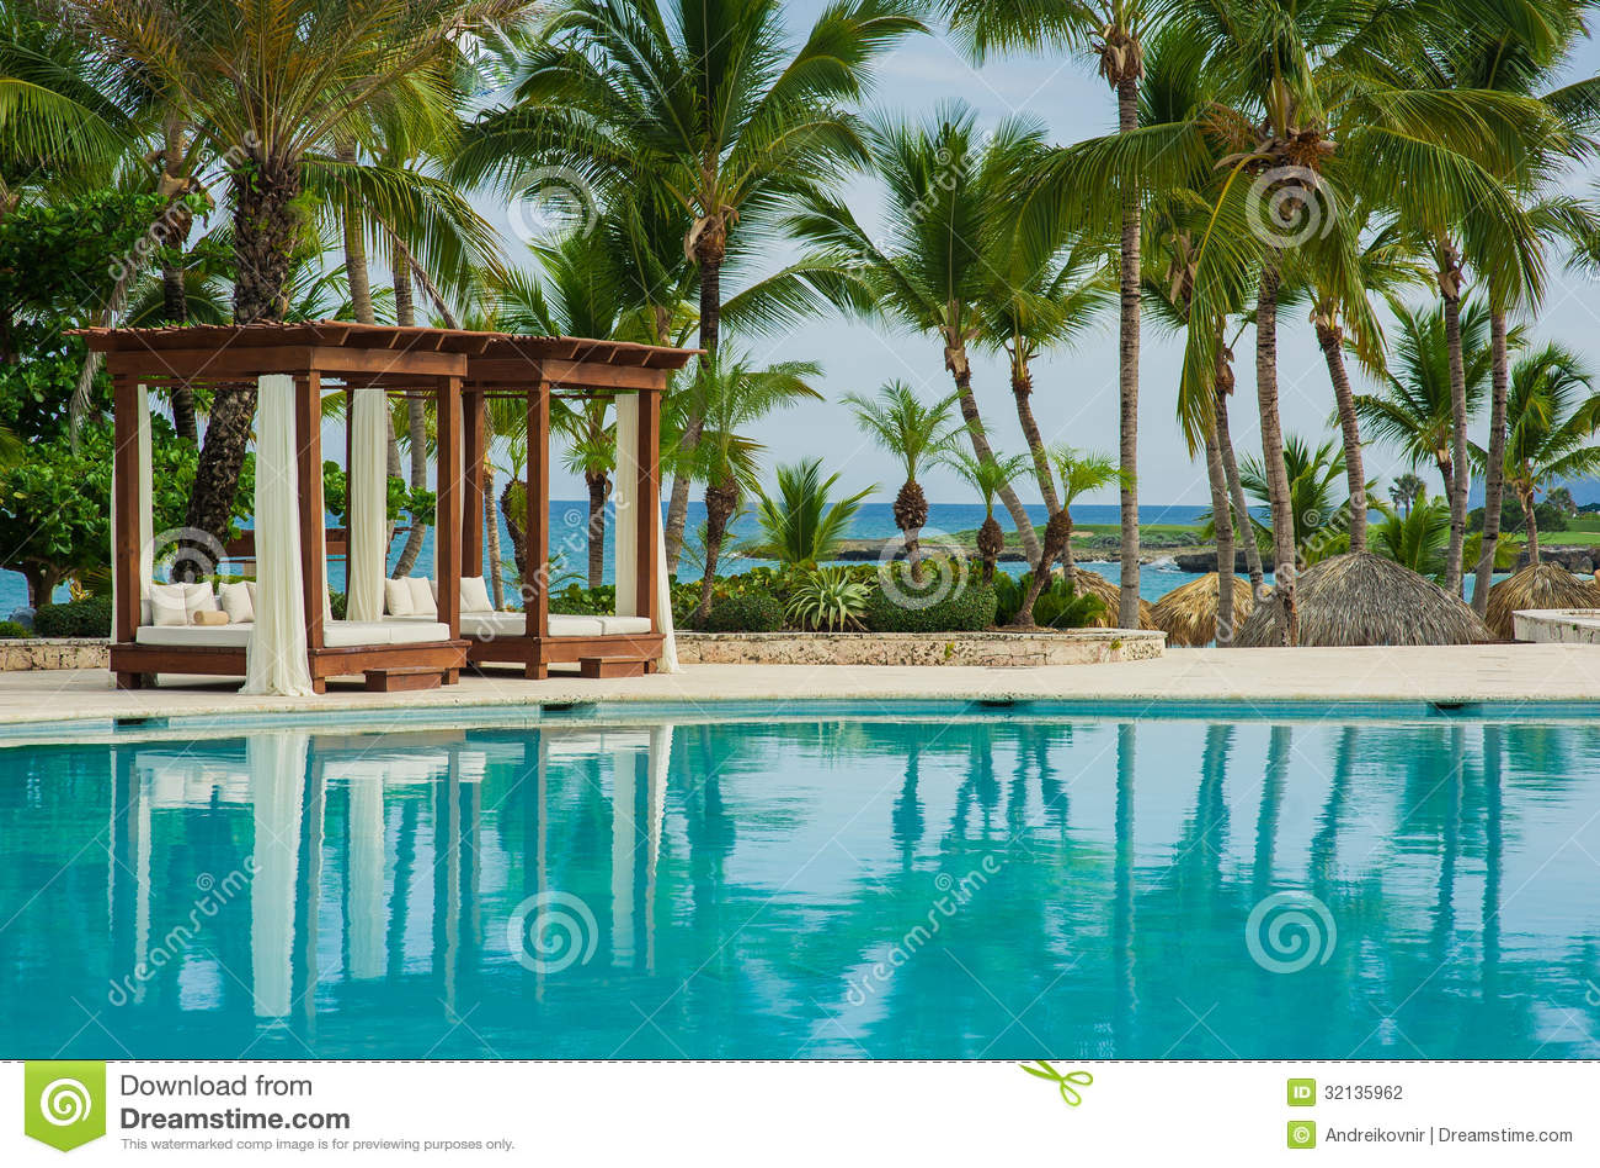 Outdoor Resort Pool Swimming Pool Of Luxury Hotel Swimming Pool In Luxury Resort Near The Sea